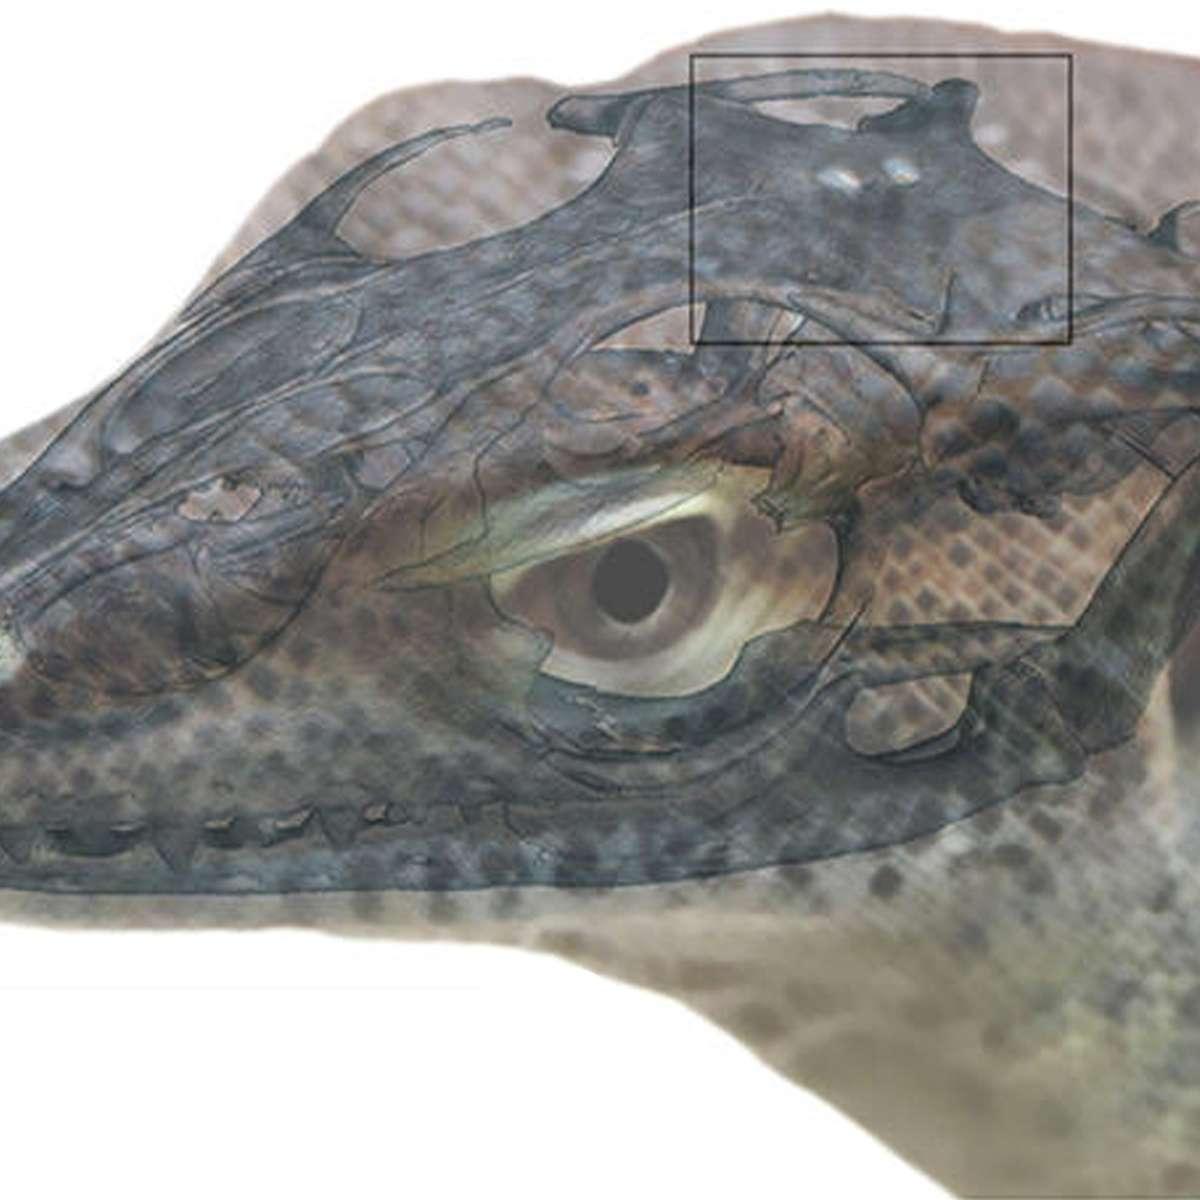 four-eyed prehistoric lizard